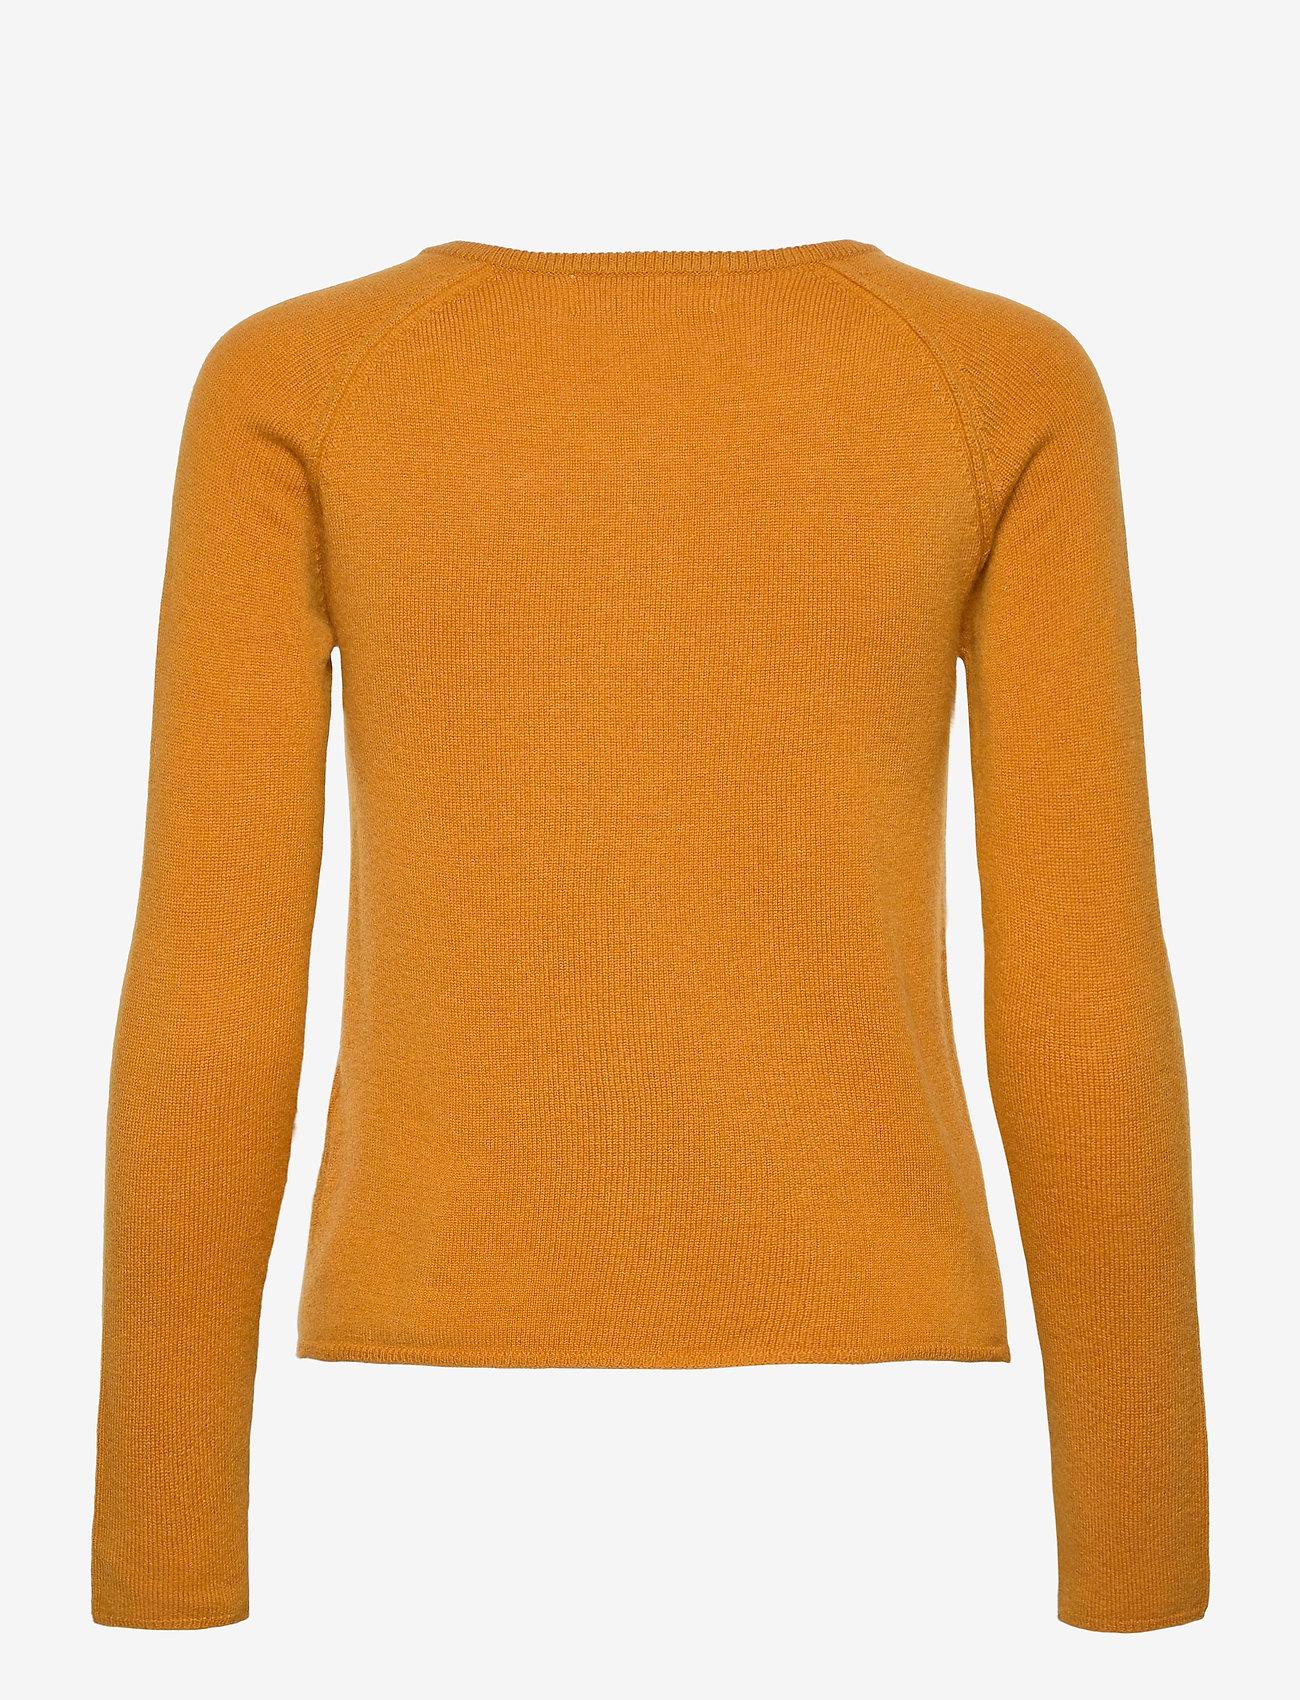 Rosemunde - Wool & cashmere cardigan ls - kashmir - golden mustard - 1